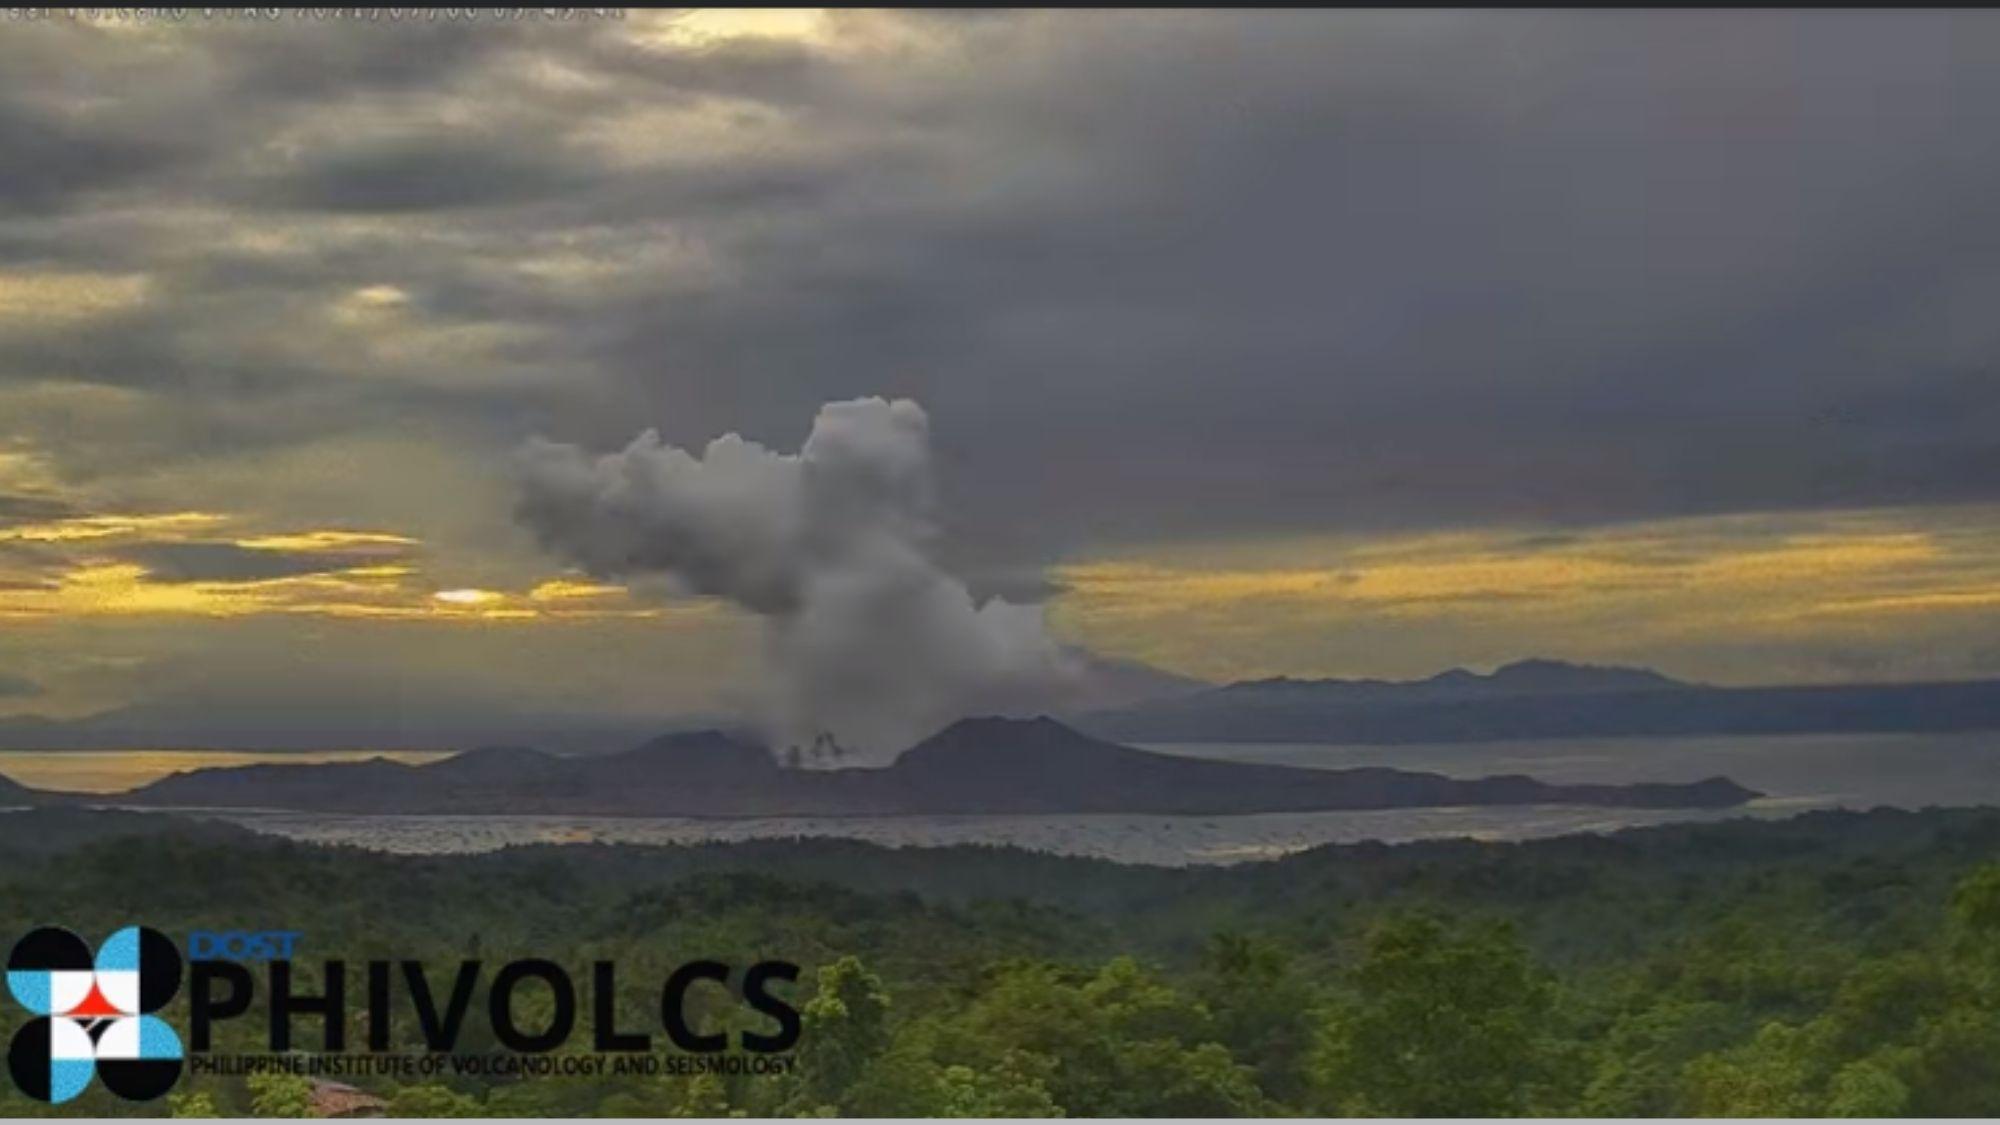 39 volcanic earthquakes, naramdaman sa paligid ng bulkang Taal